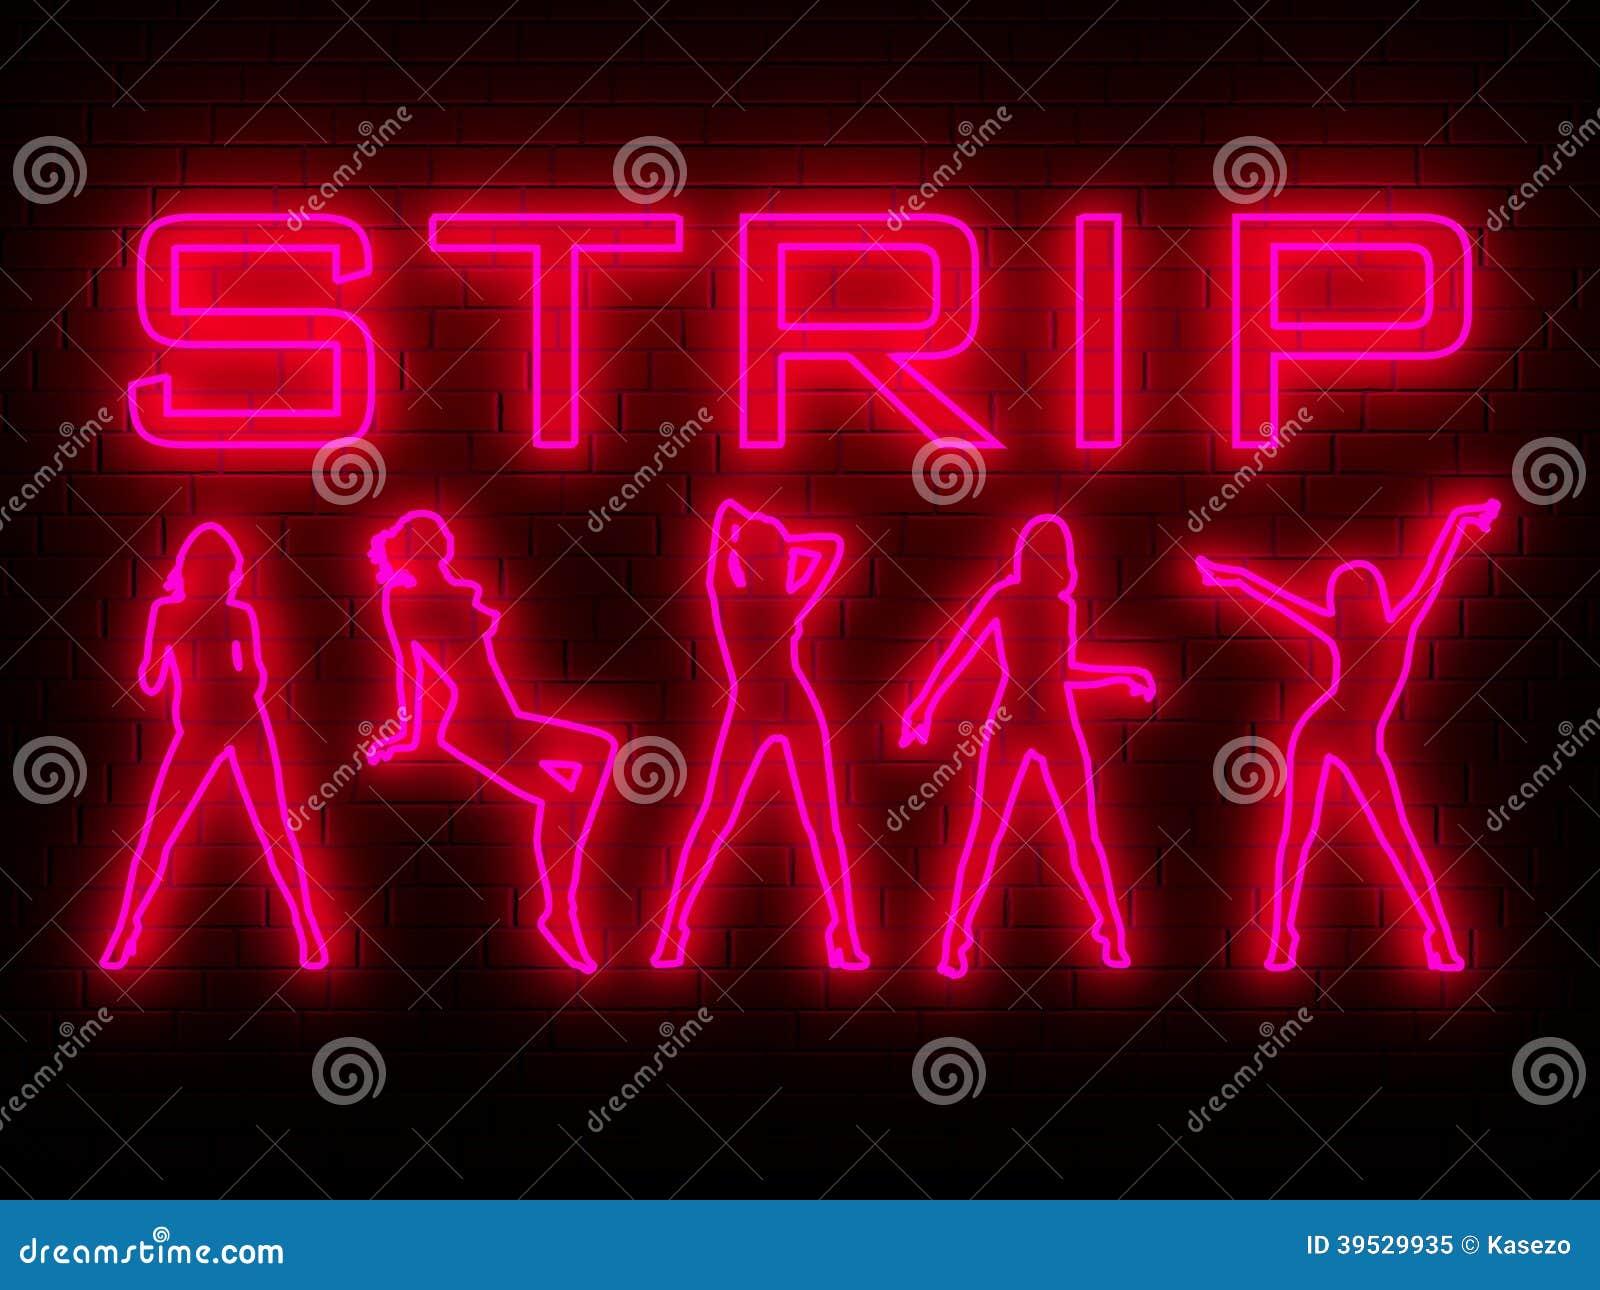 Strip Bar Wall Neon Stock Illustration Image 39529935